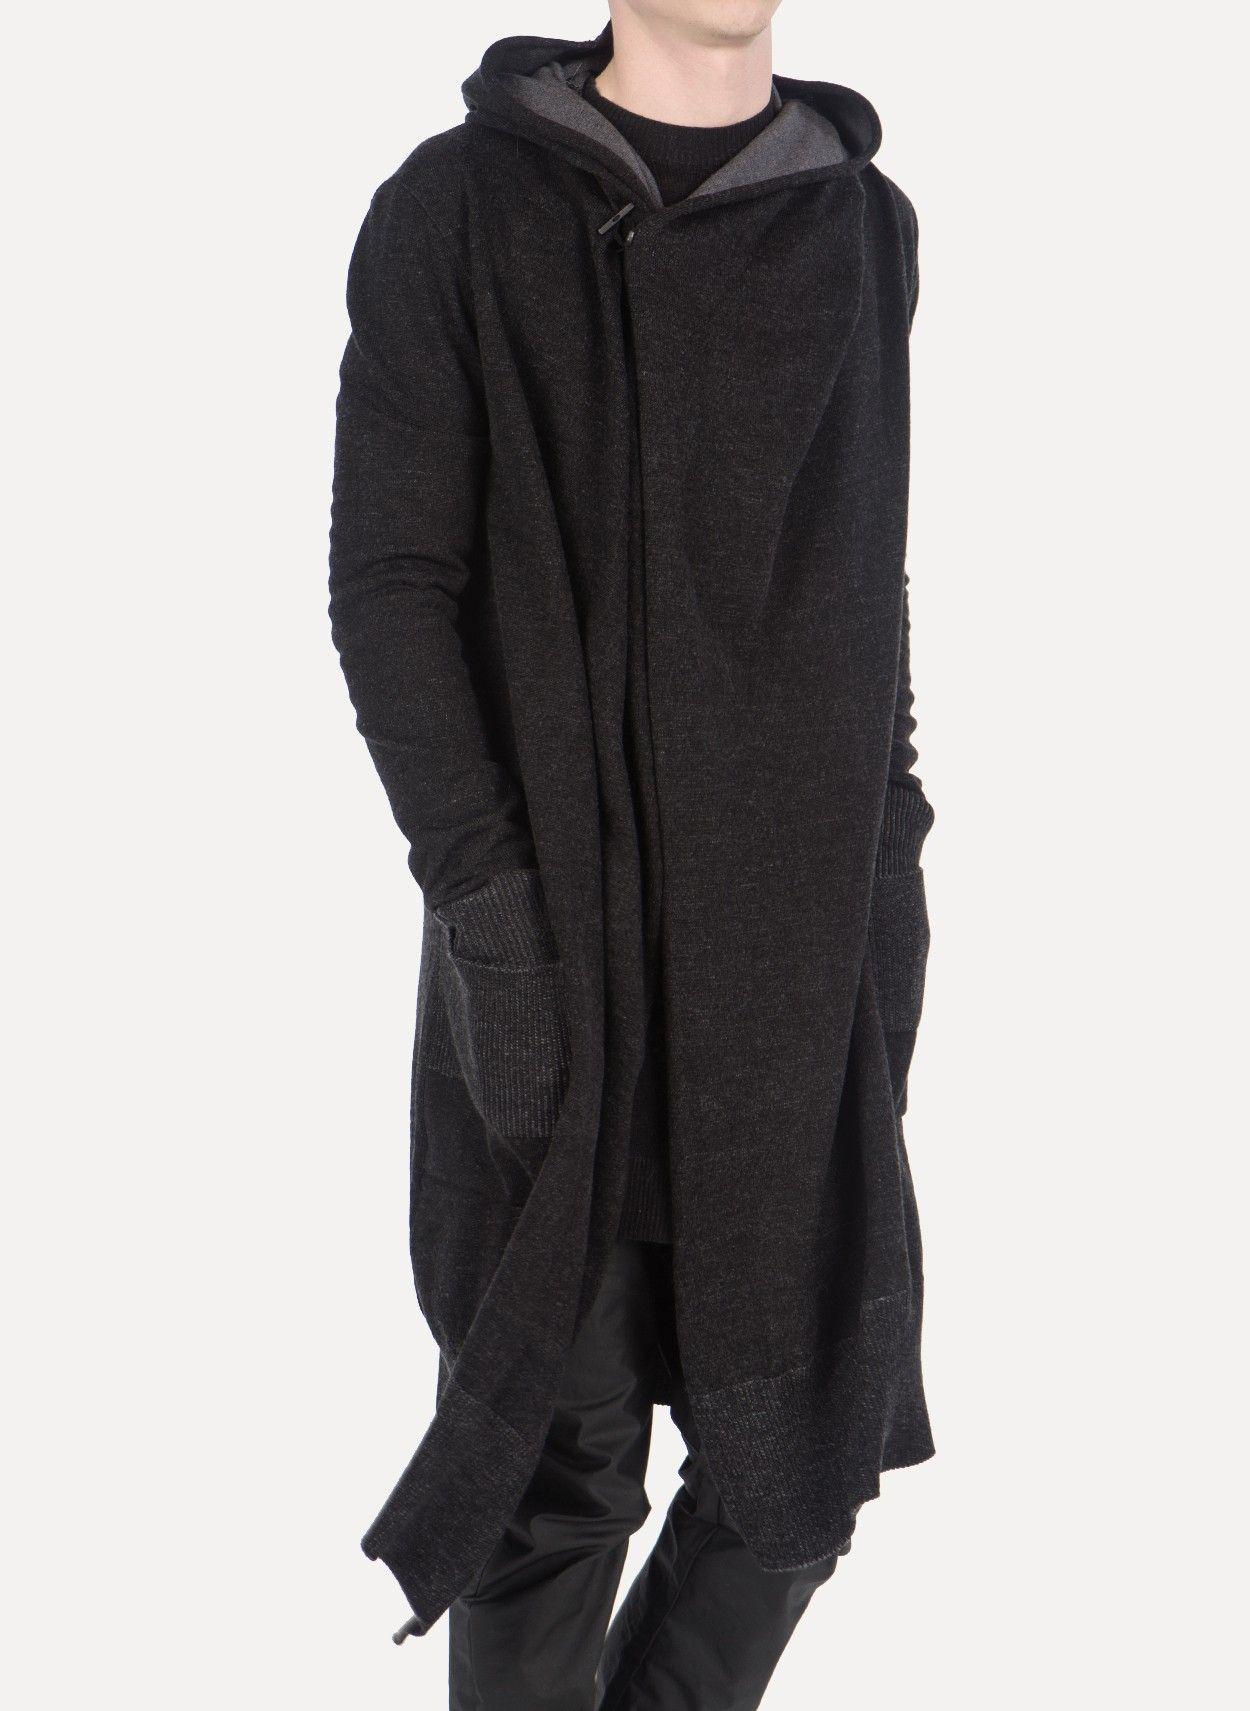 Daniel Andresen - SULA 623 Virgin Wool Long Hooded Cardigan https ...